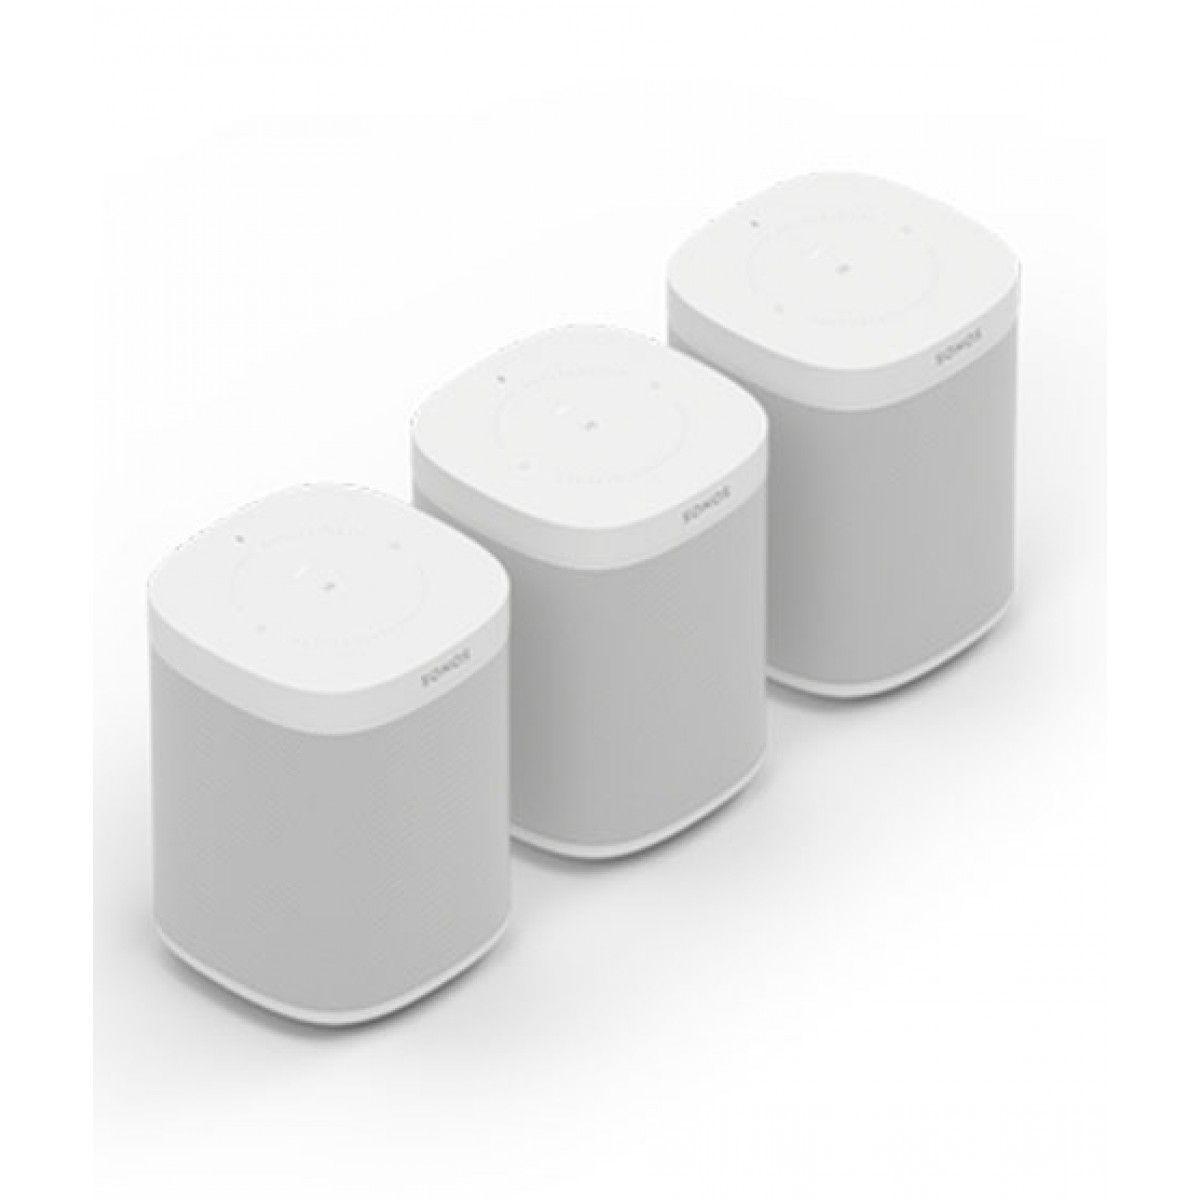 Sonos One Wireless Smart Speaker Set Of 3